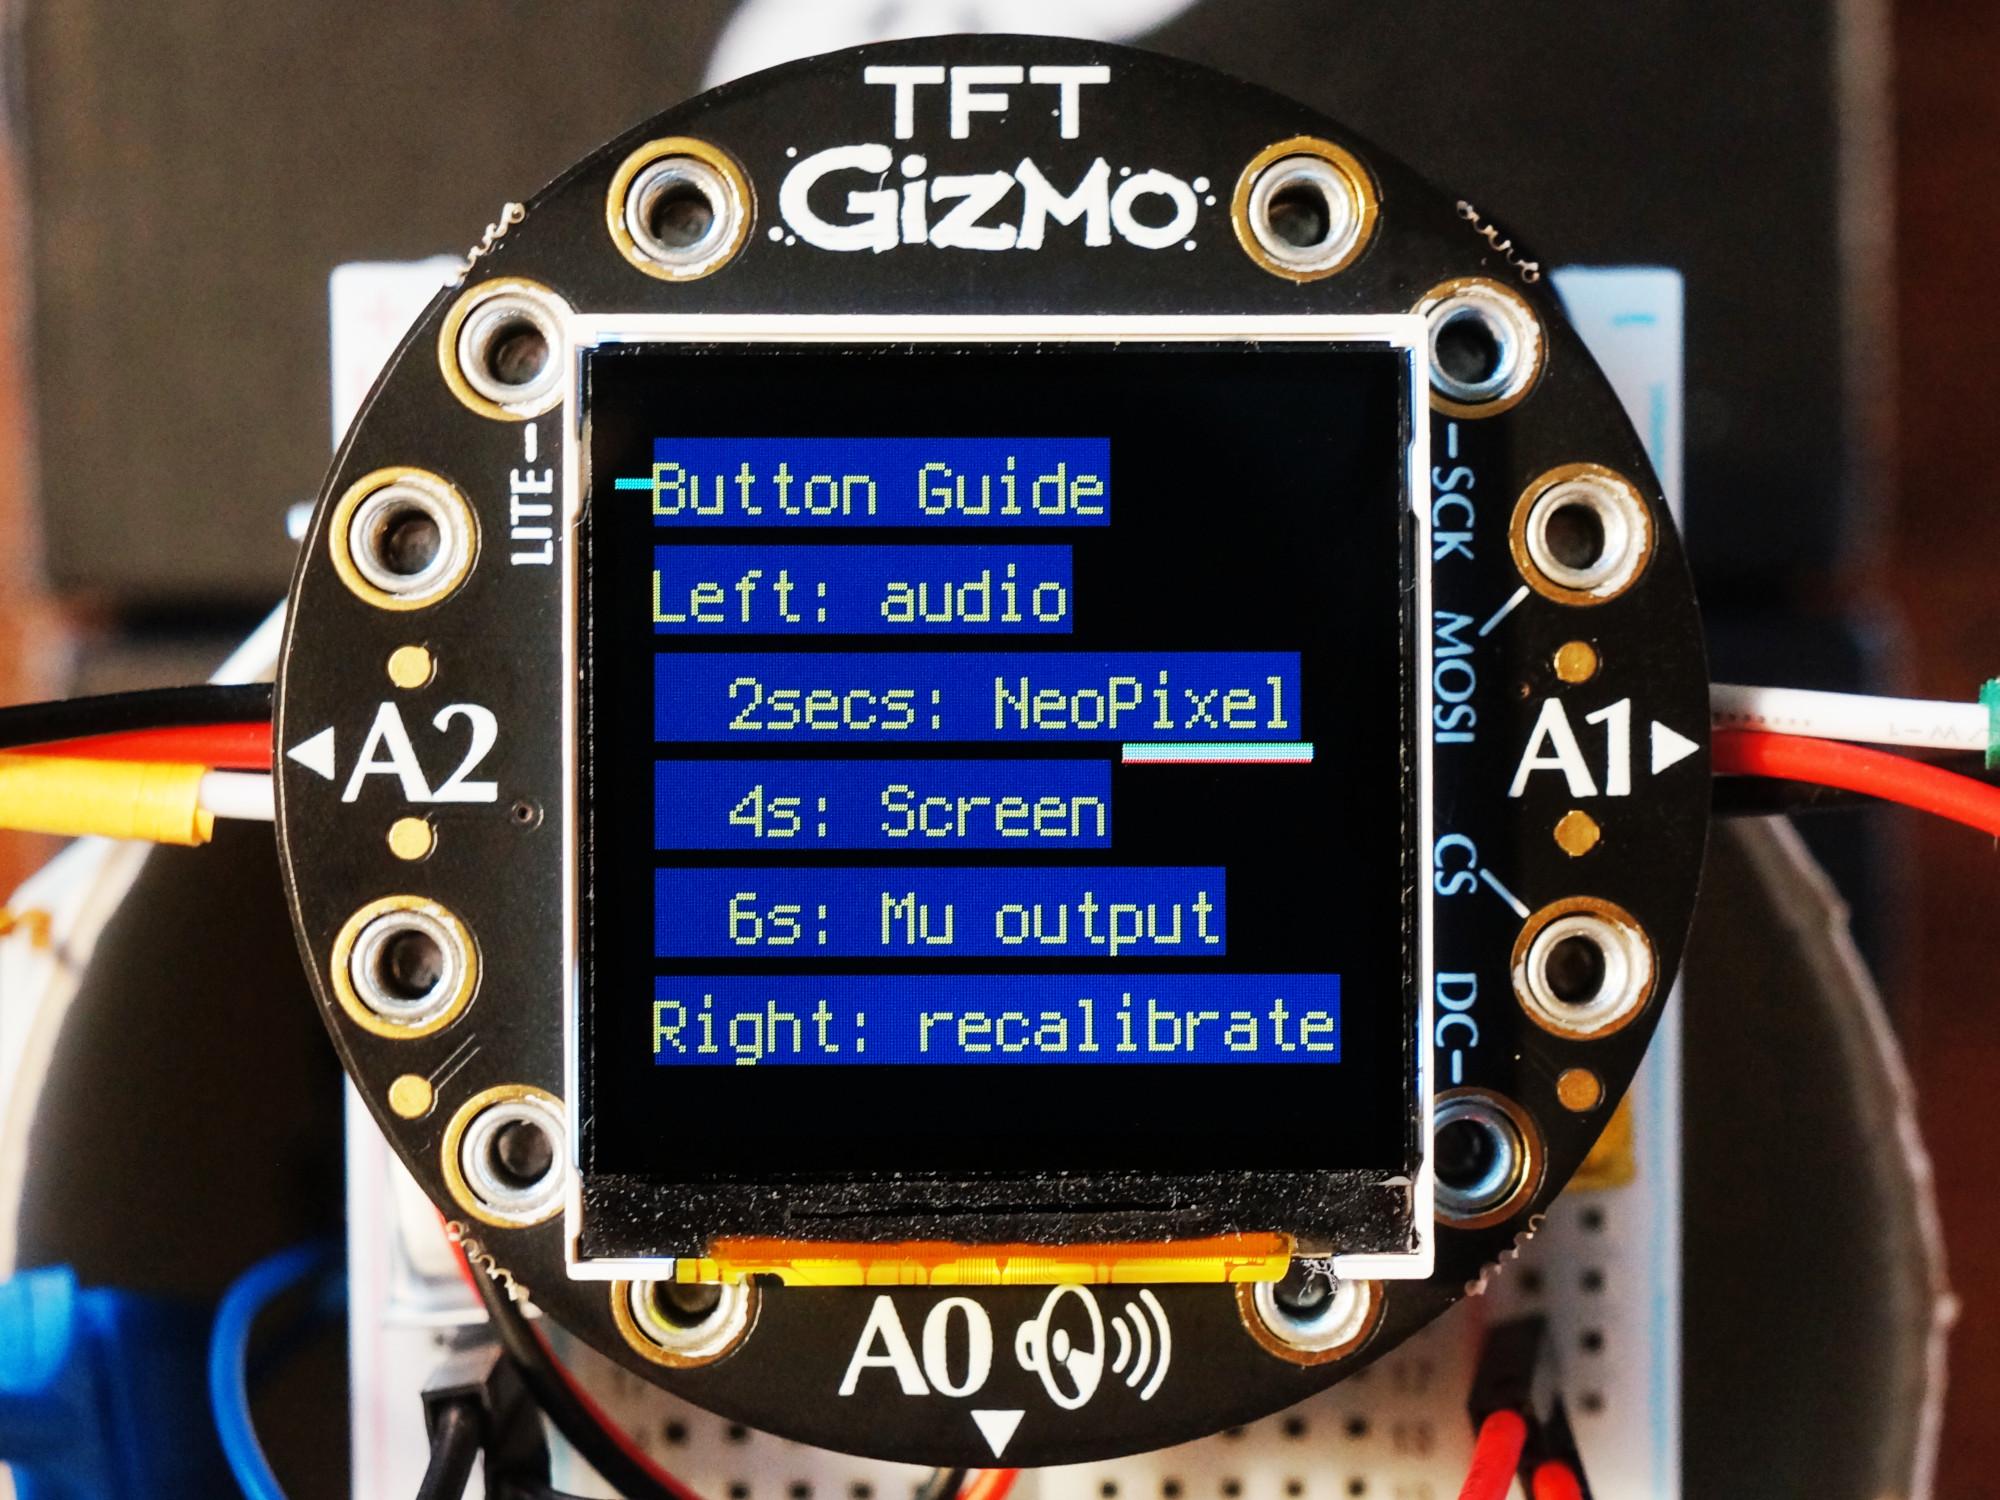 sensors_cpb-gizmo-metal-detector-button-guide-1-2000x1500.jpg